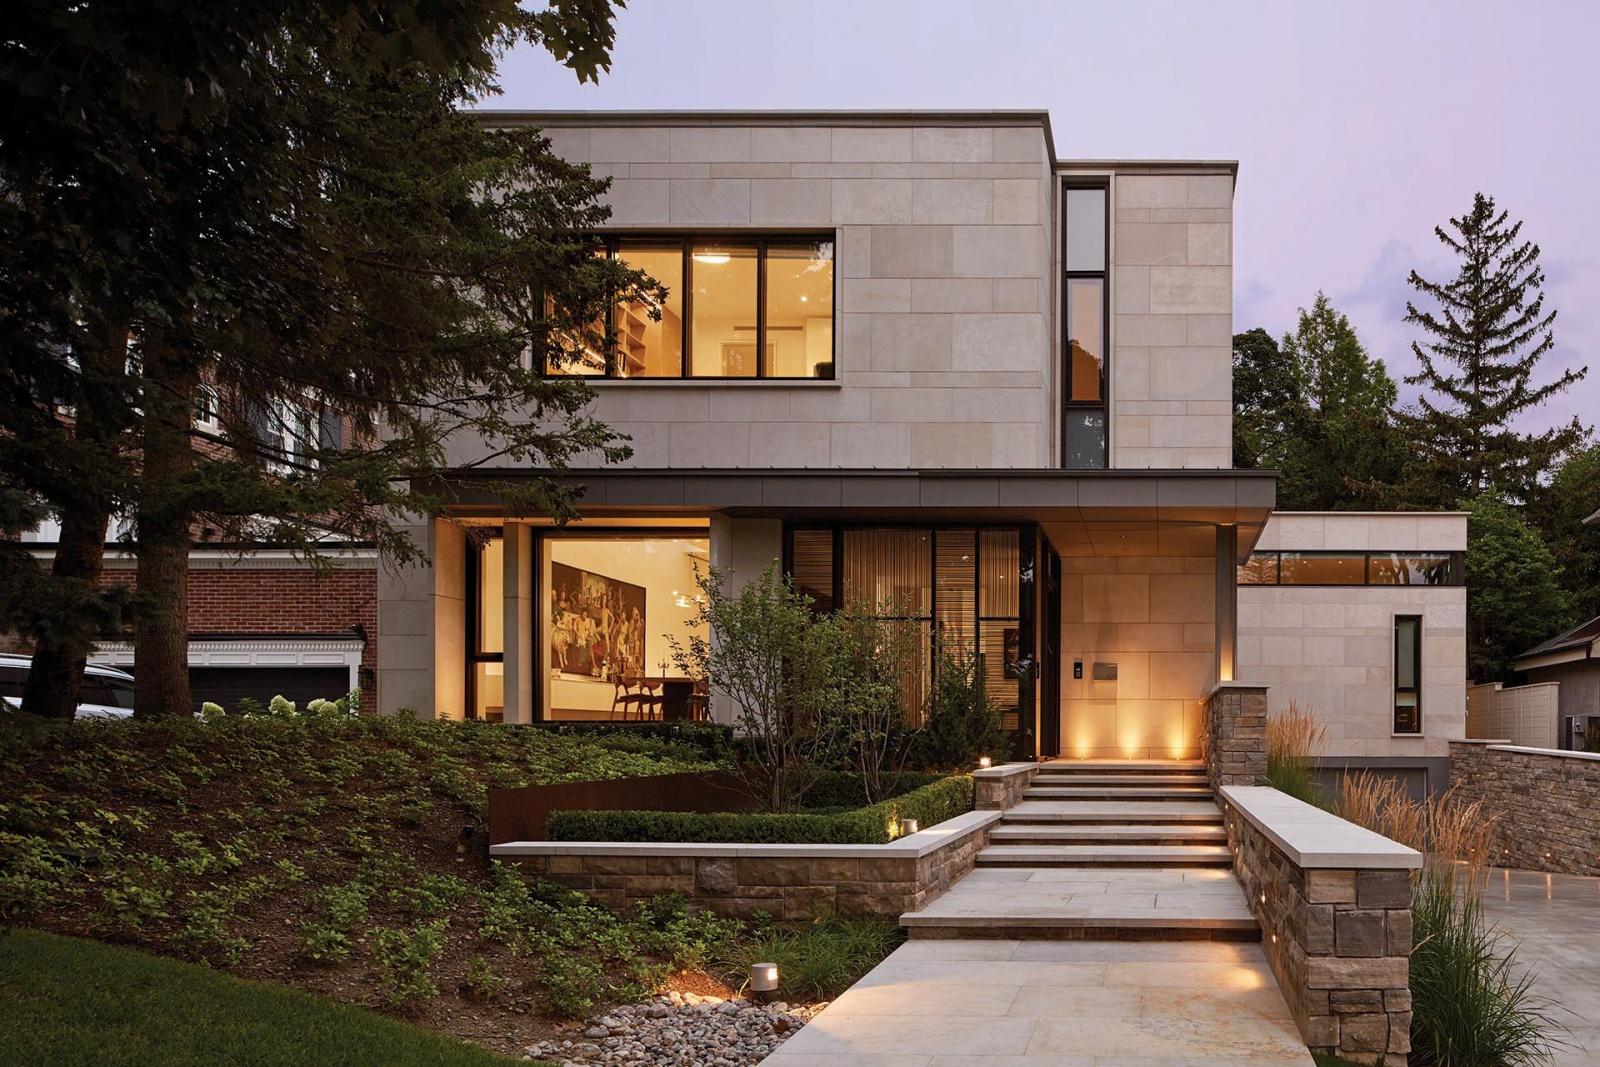 modern-house-architecture-limestone-280820-1043-02.jpg